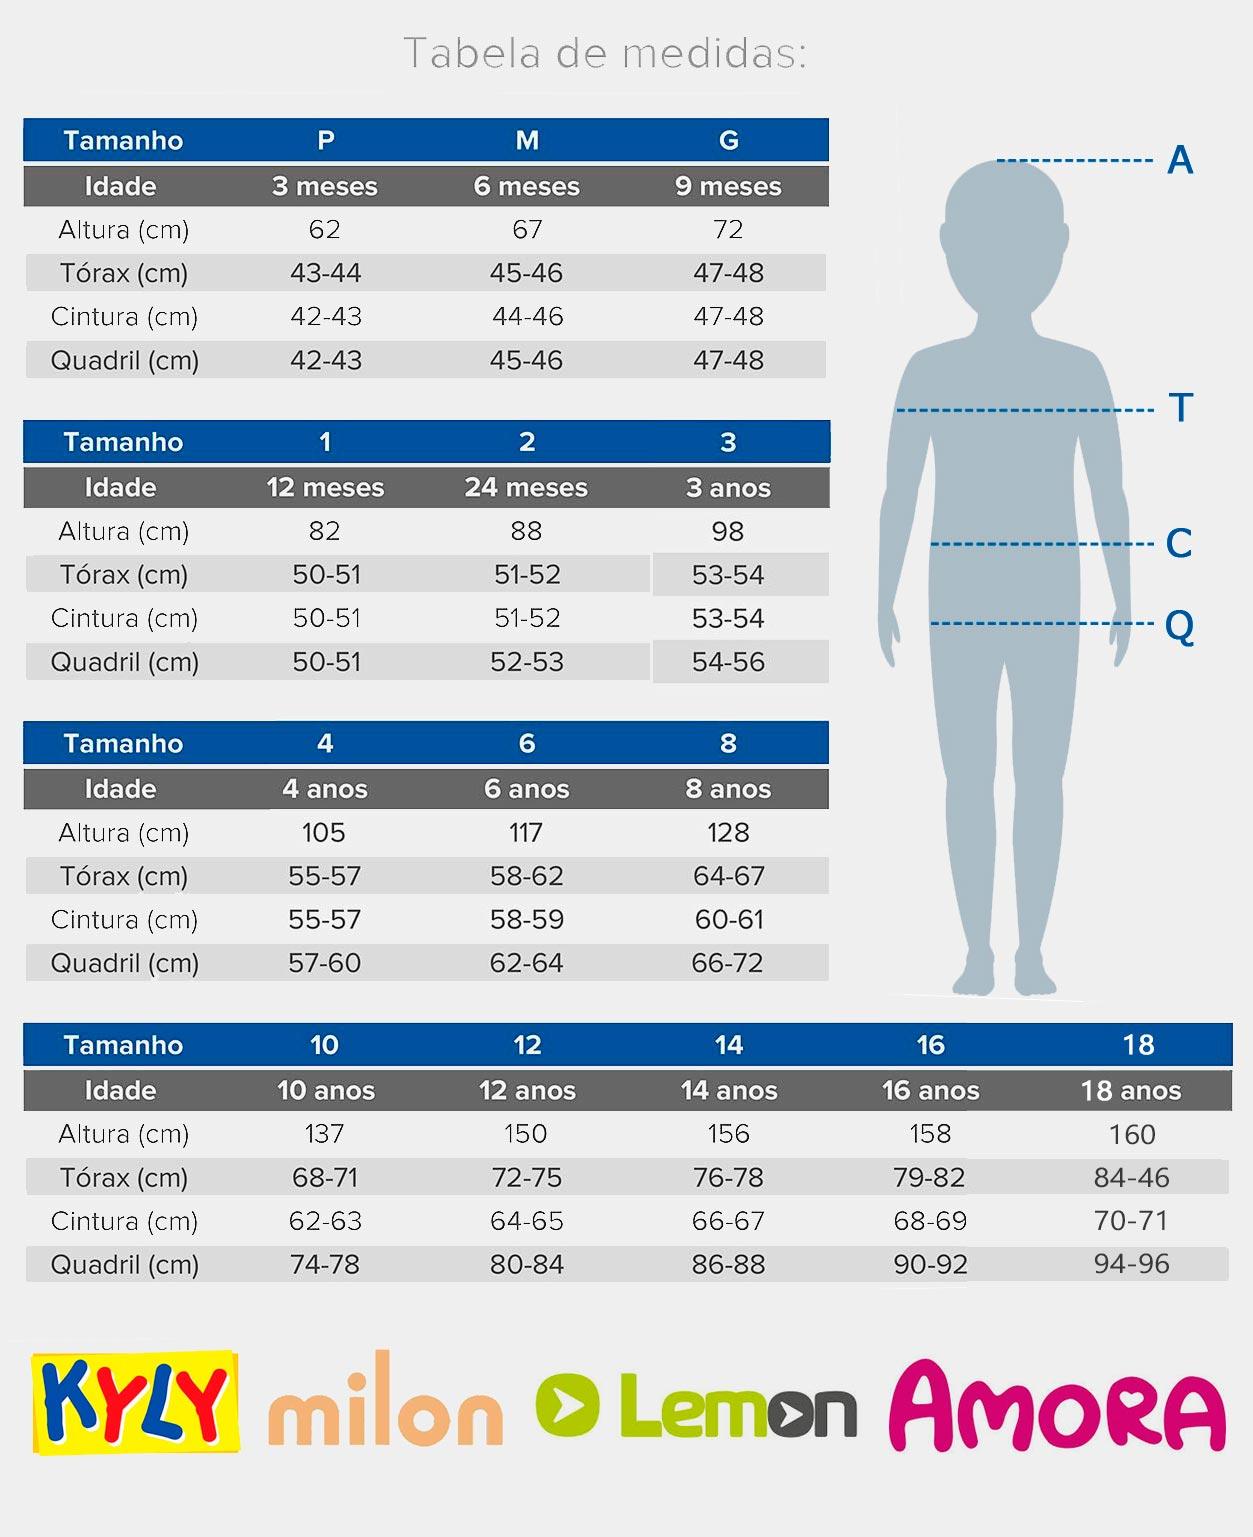 Conjunto Infantil Feminino Curto Preto Life - Kyly: Tabela de medidas